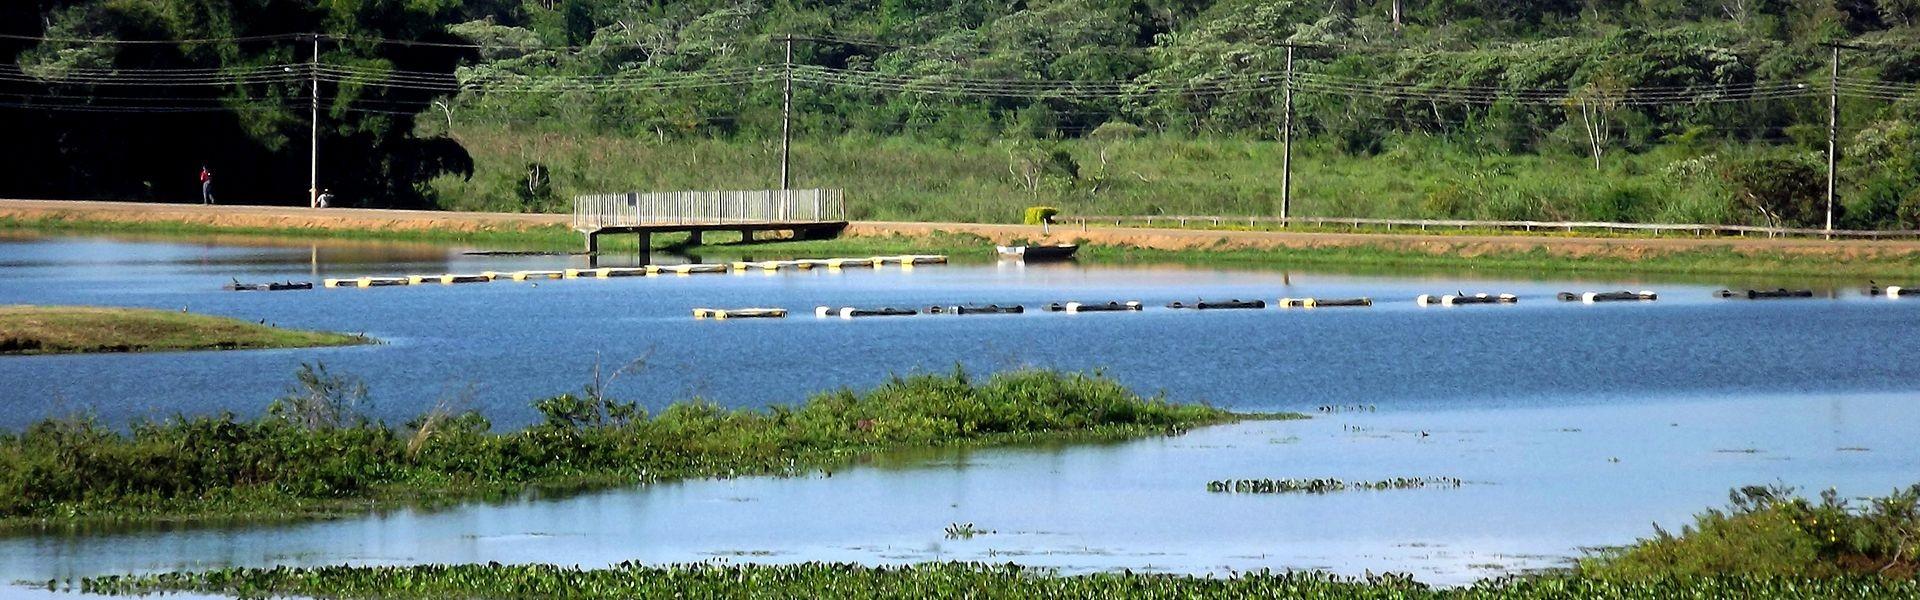 Instituto de Pesca oferece curso sobre piscicultura